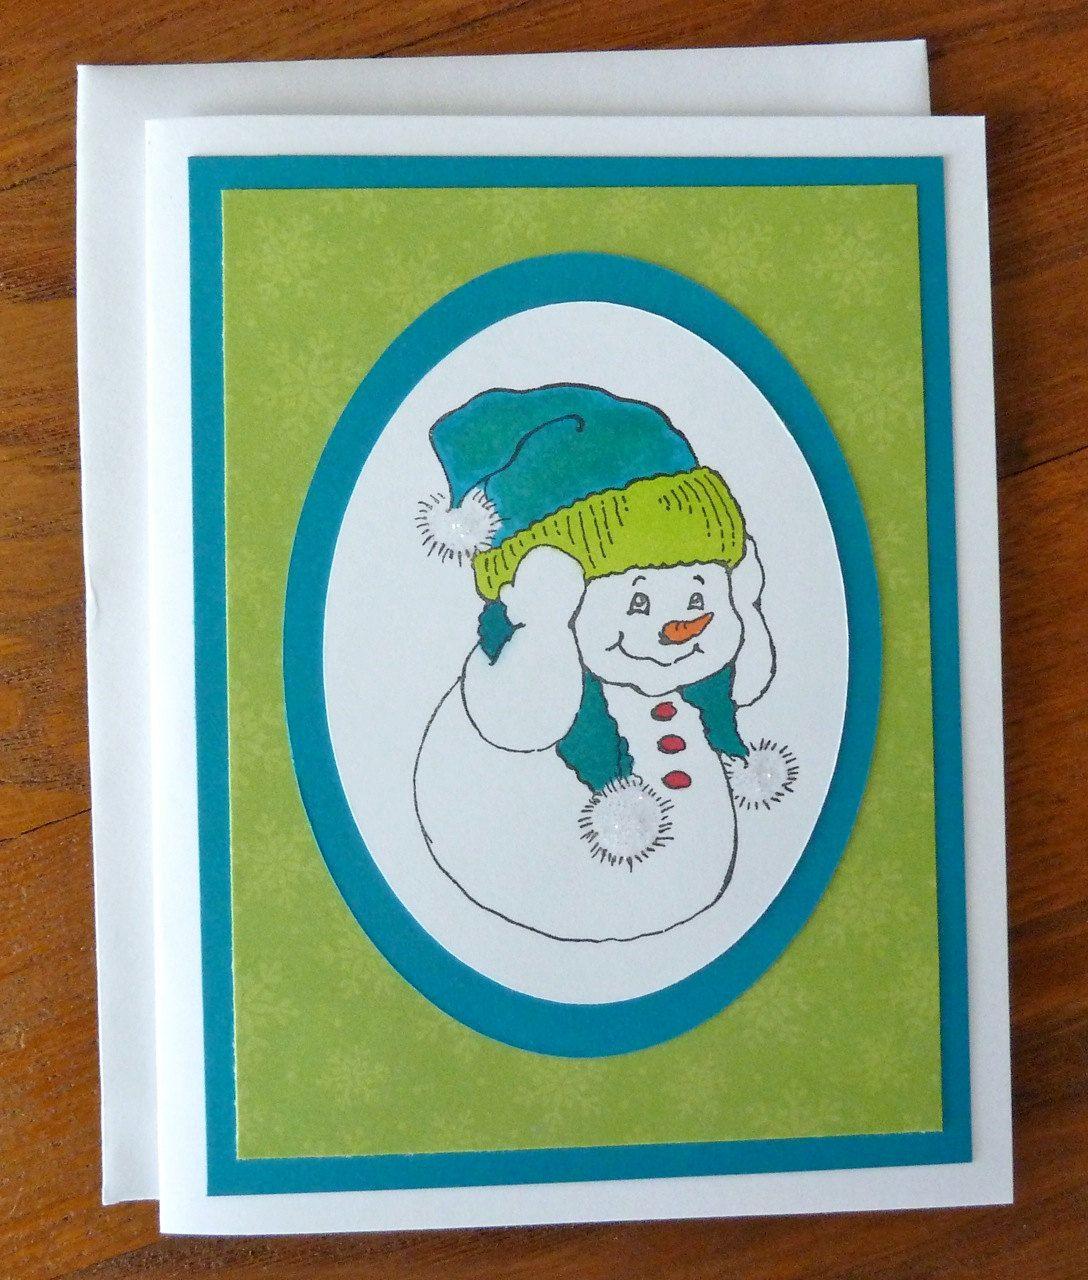 Winter greeting card handmade snowman card cute winter card winter greeting card handmade snowman card cute winter card winter birthday card kristyandbryce Images